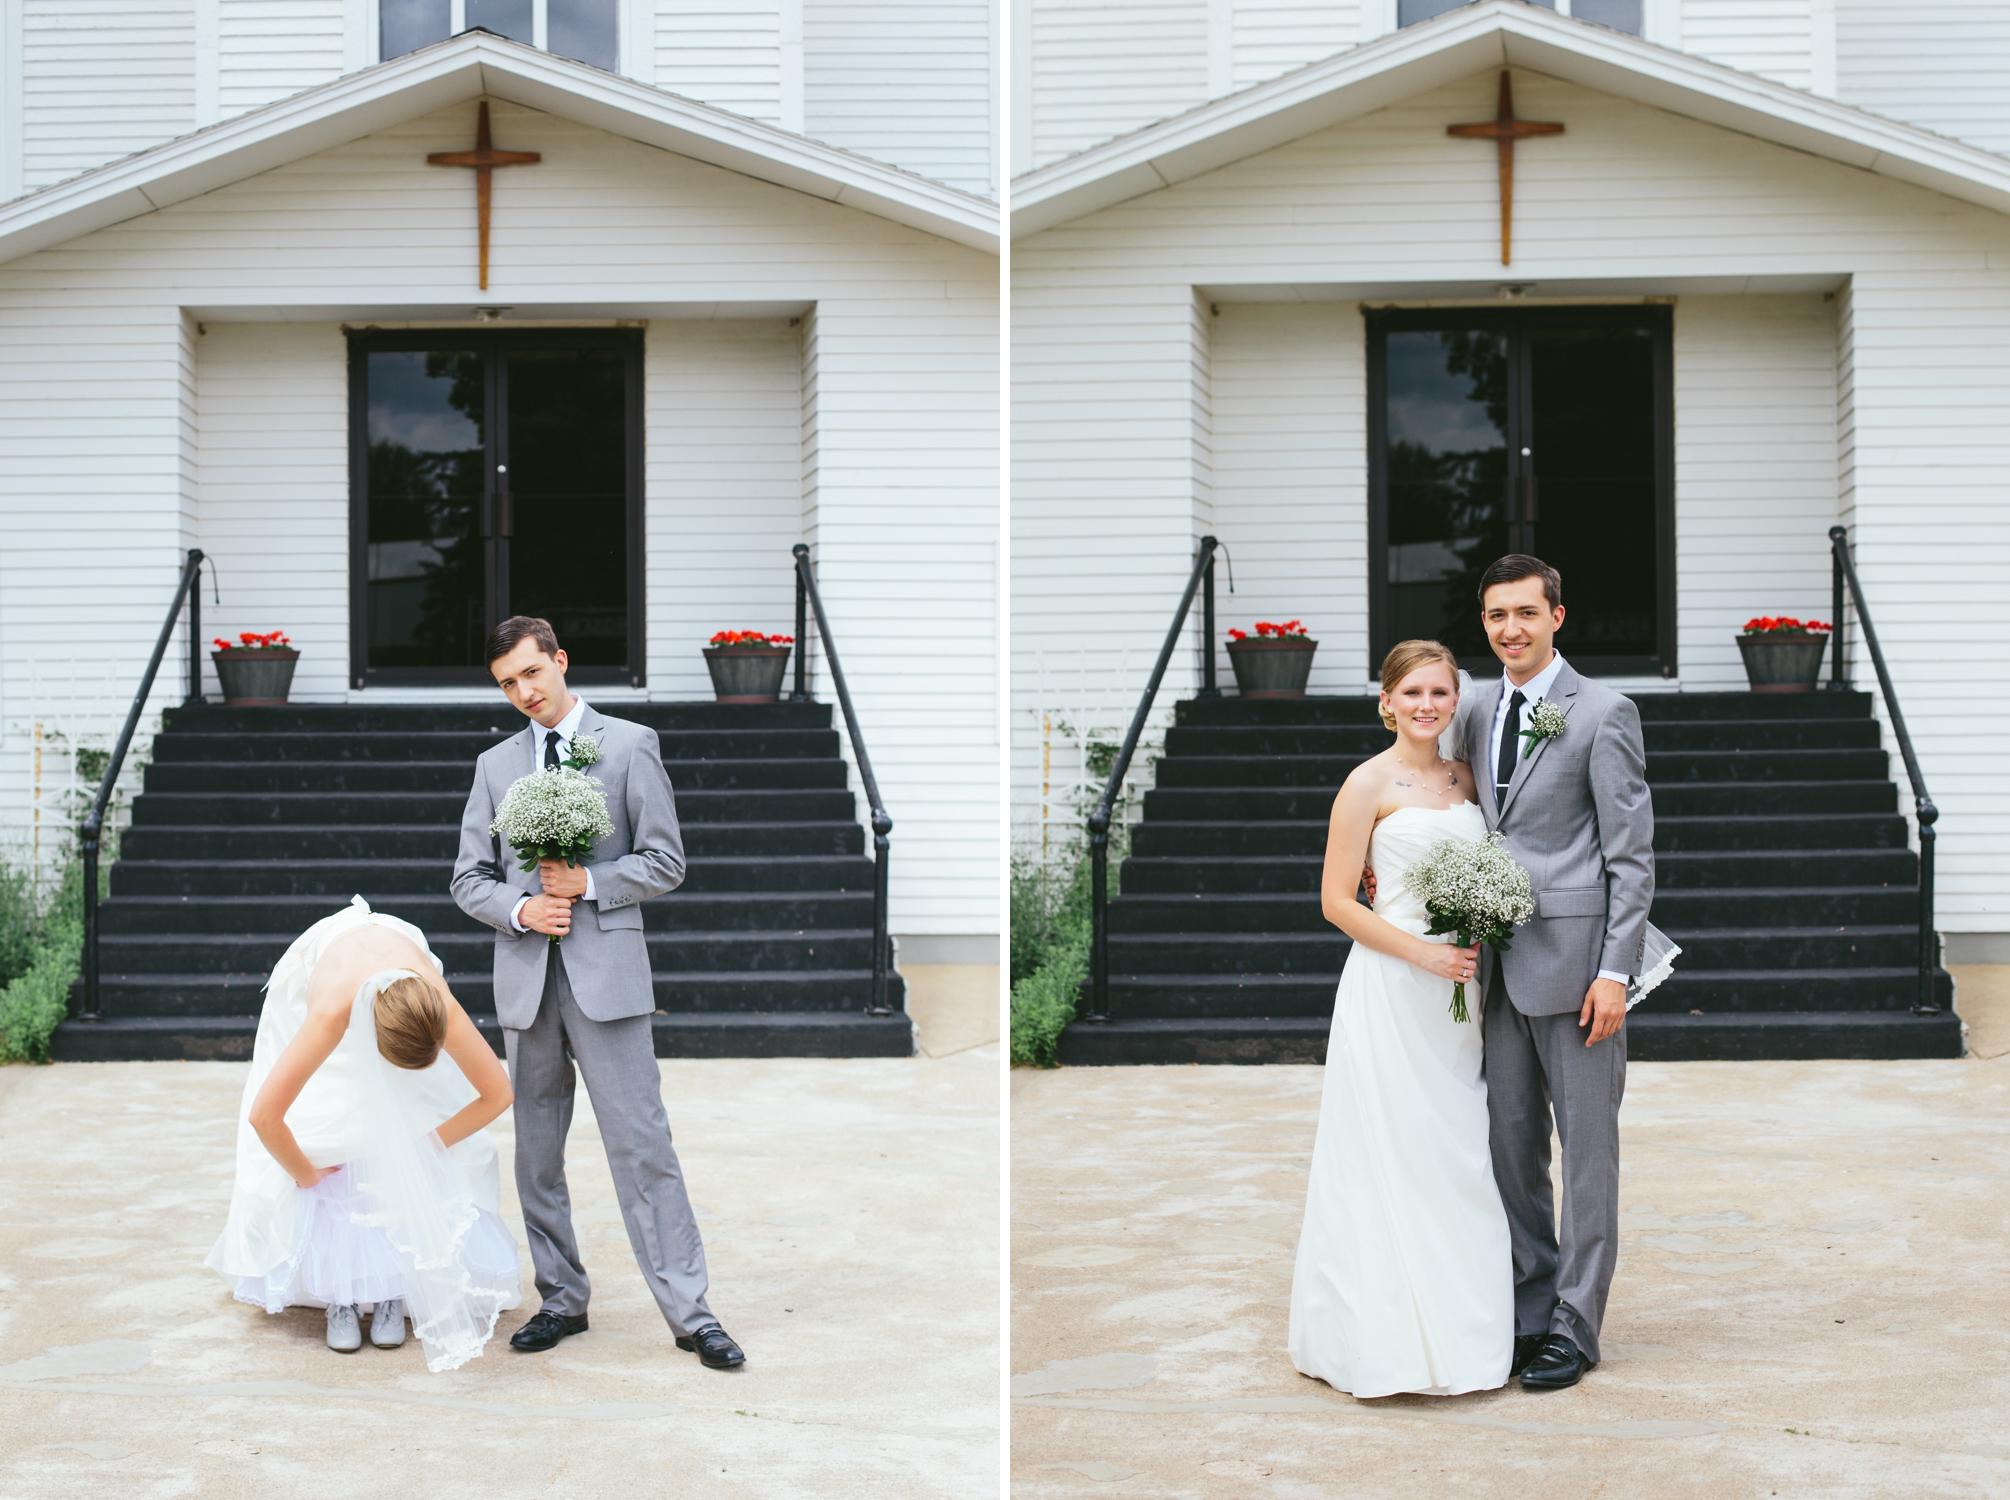 South-Dakota-Intimate-Wedding-12.jpg